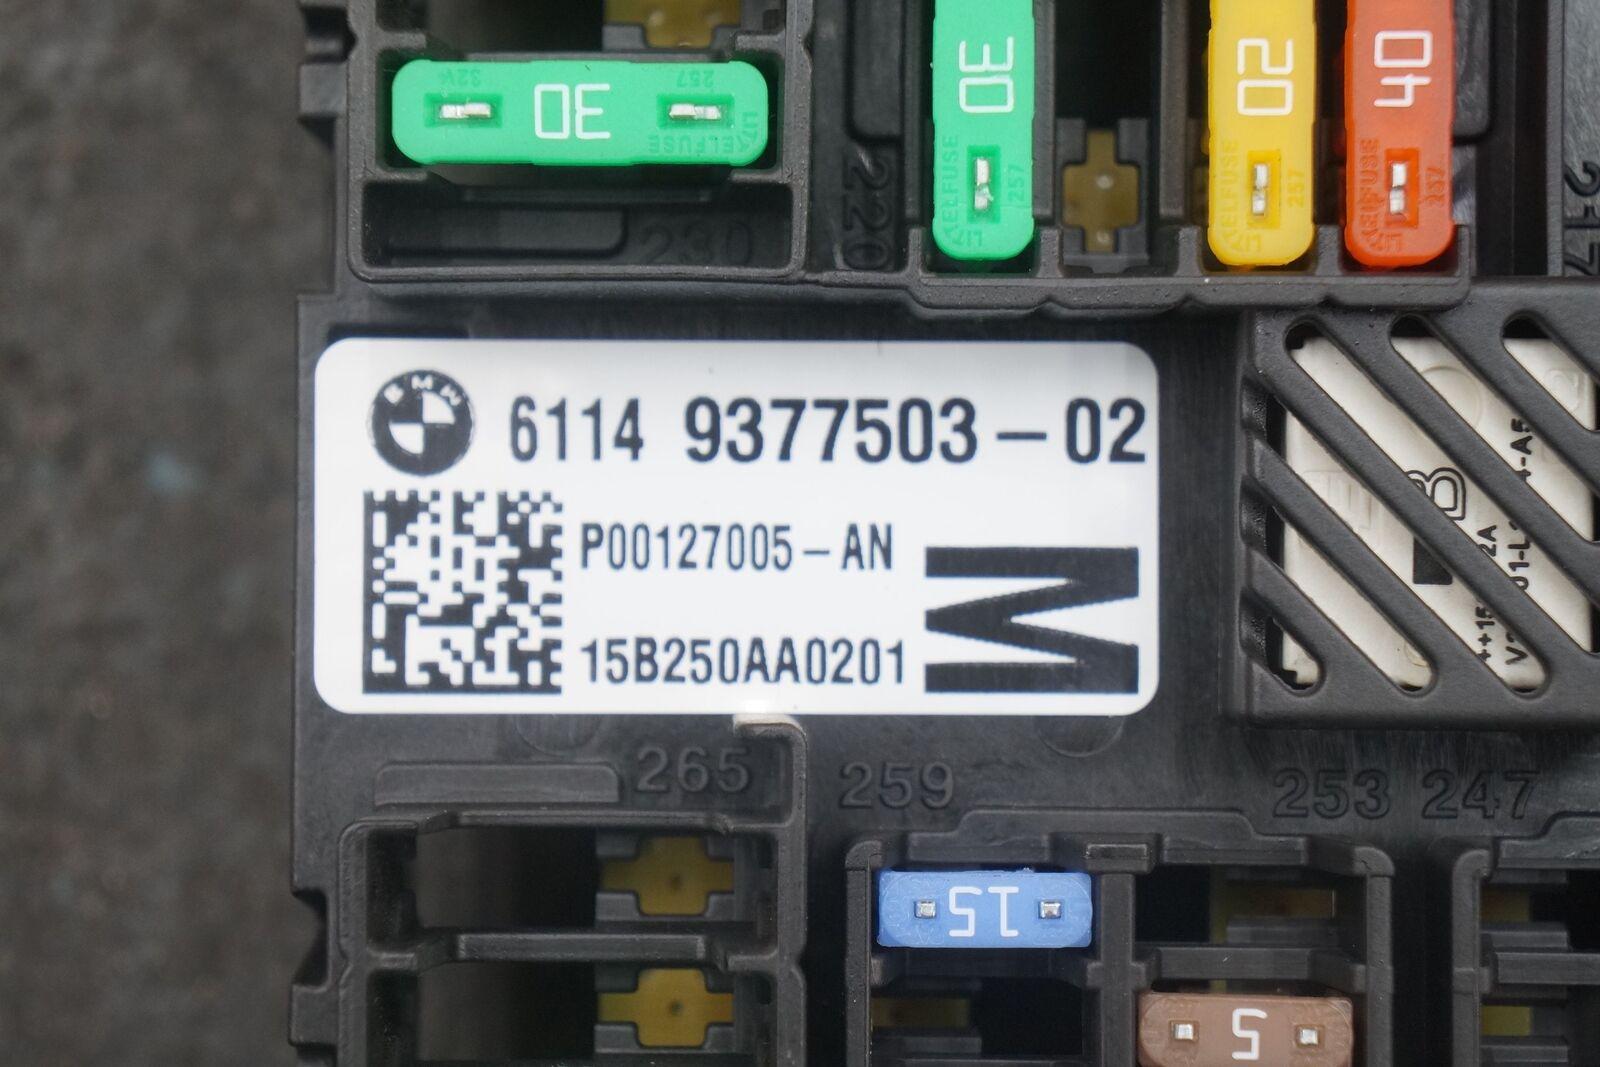 Rear Power Distribution Fuse Box Block 61149377503 Bmw 750i 740i G11